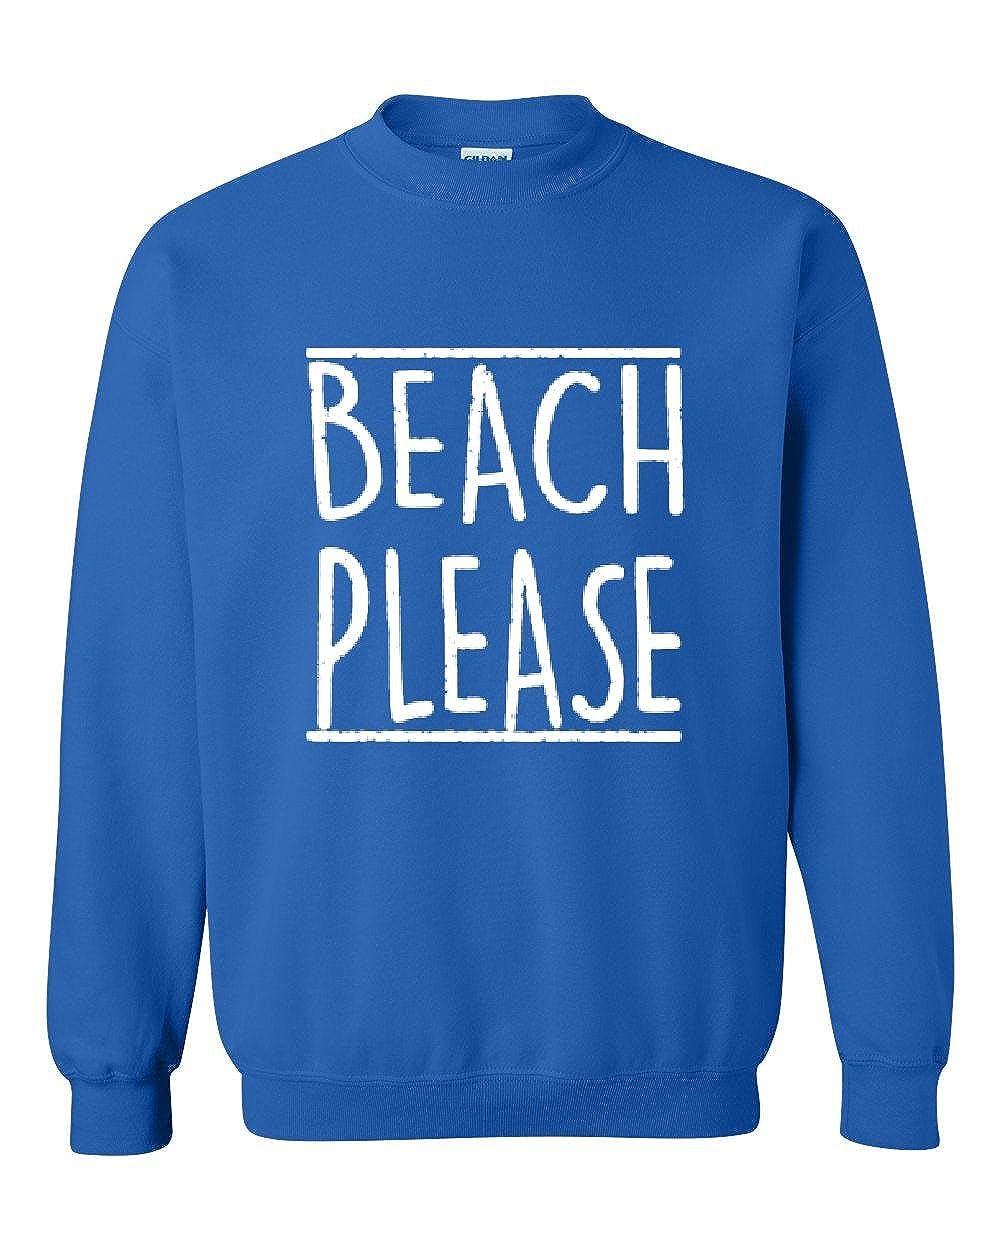 Moms Favorite Beach Sweatshirt Beach Please Summer Vacation Funny Birthday Gift Unisex Crewneck Sweater